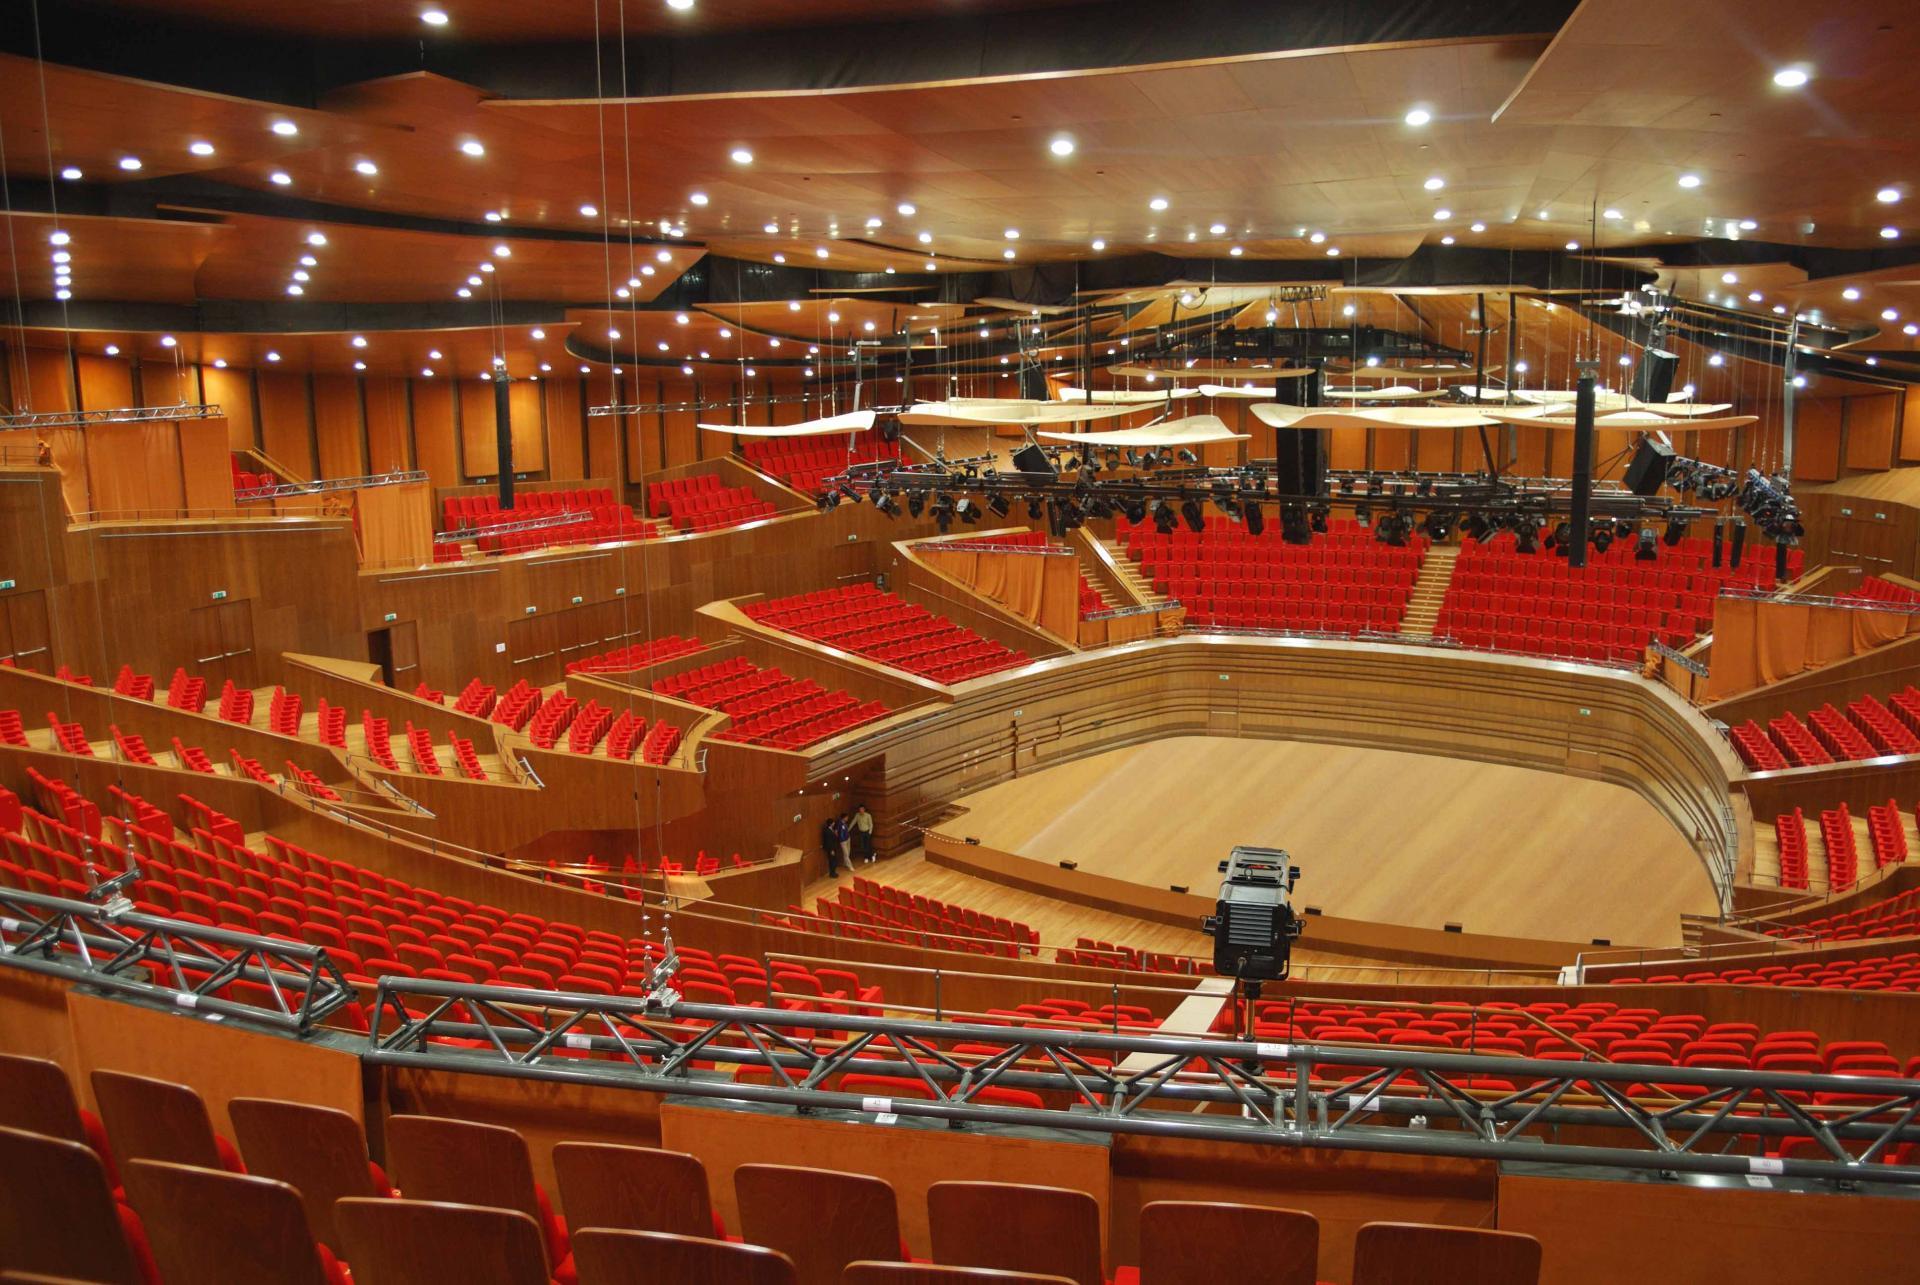 Центральный концертный зал «Казахстан» фото 4